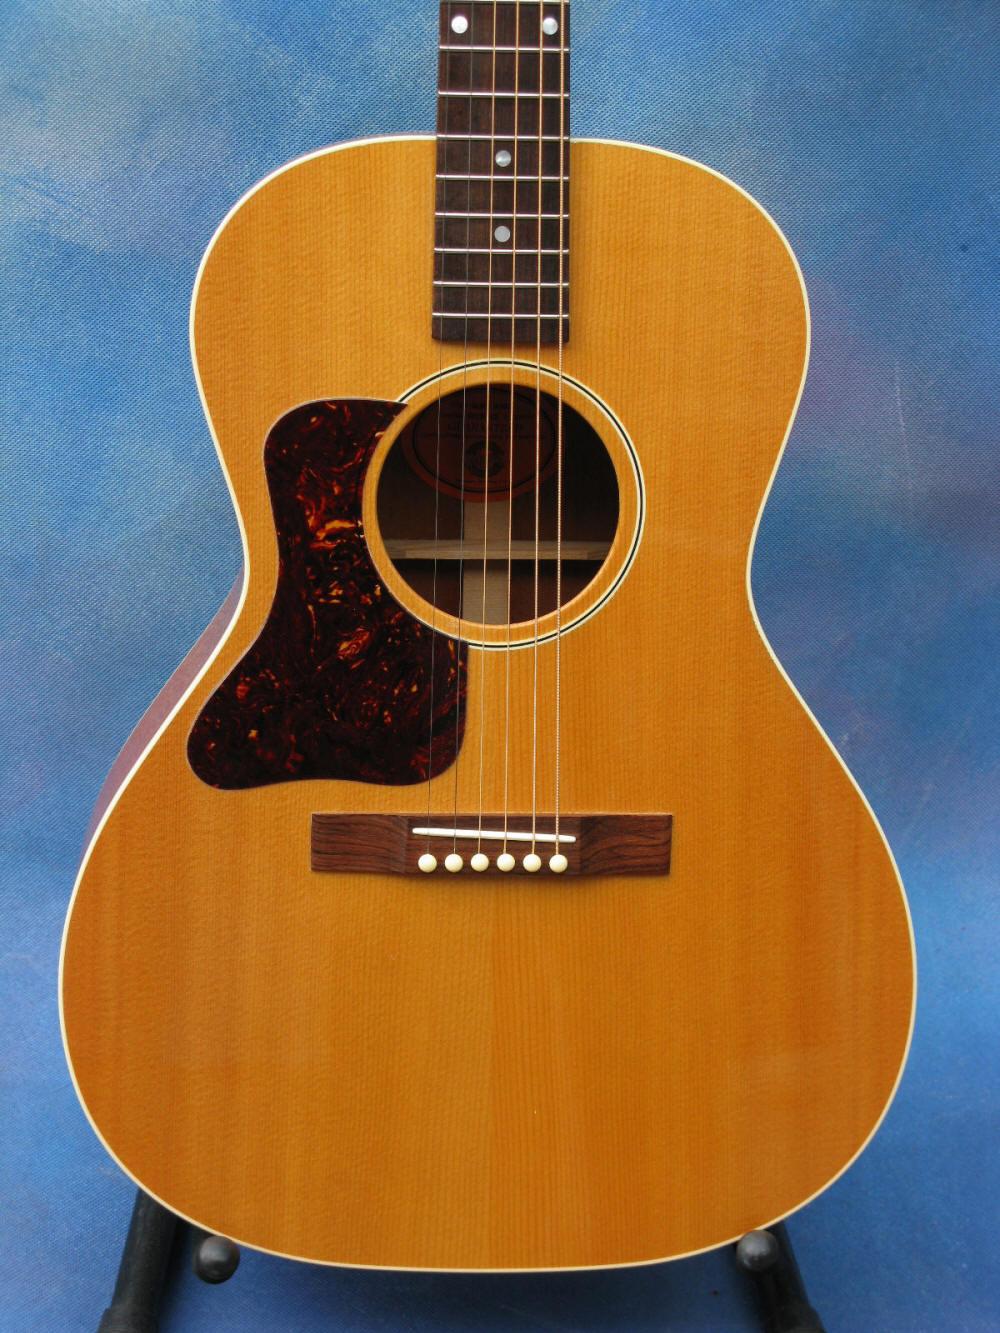 Guitares format Parlor - Page 5 Bluesk66